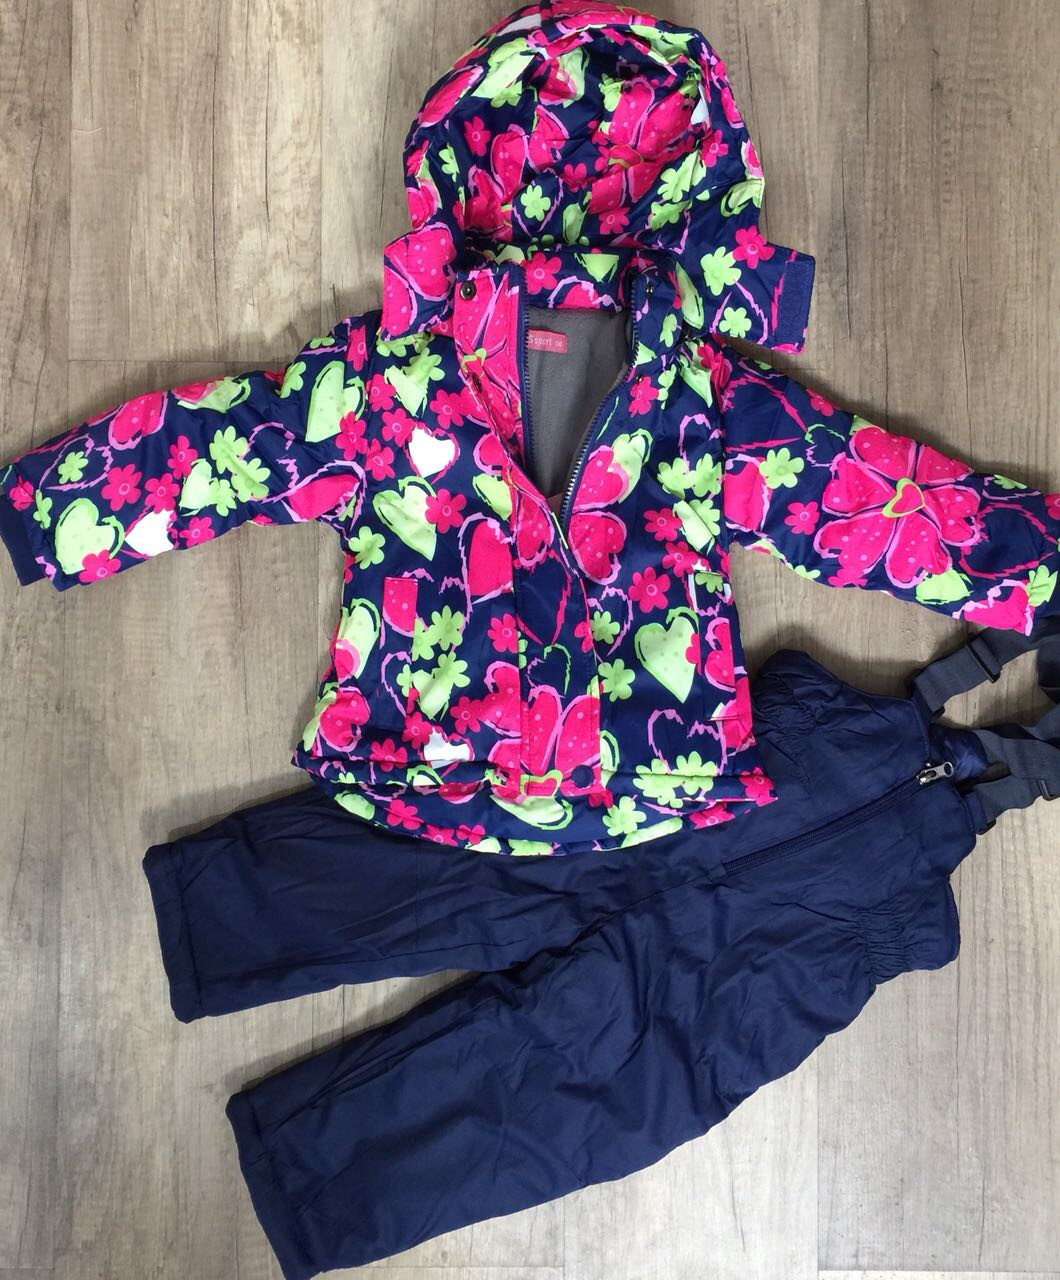 Комбинезон для девочек на флисе оптом (куртка +комбинезон), Taurus, 98-128 рр.,DL-612